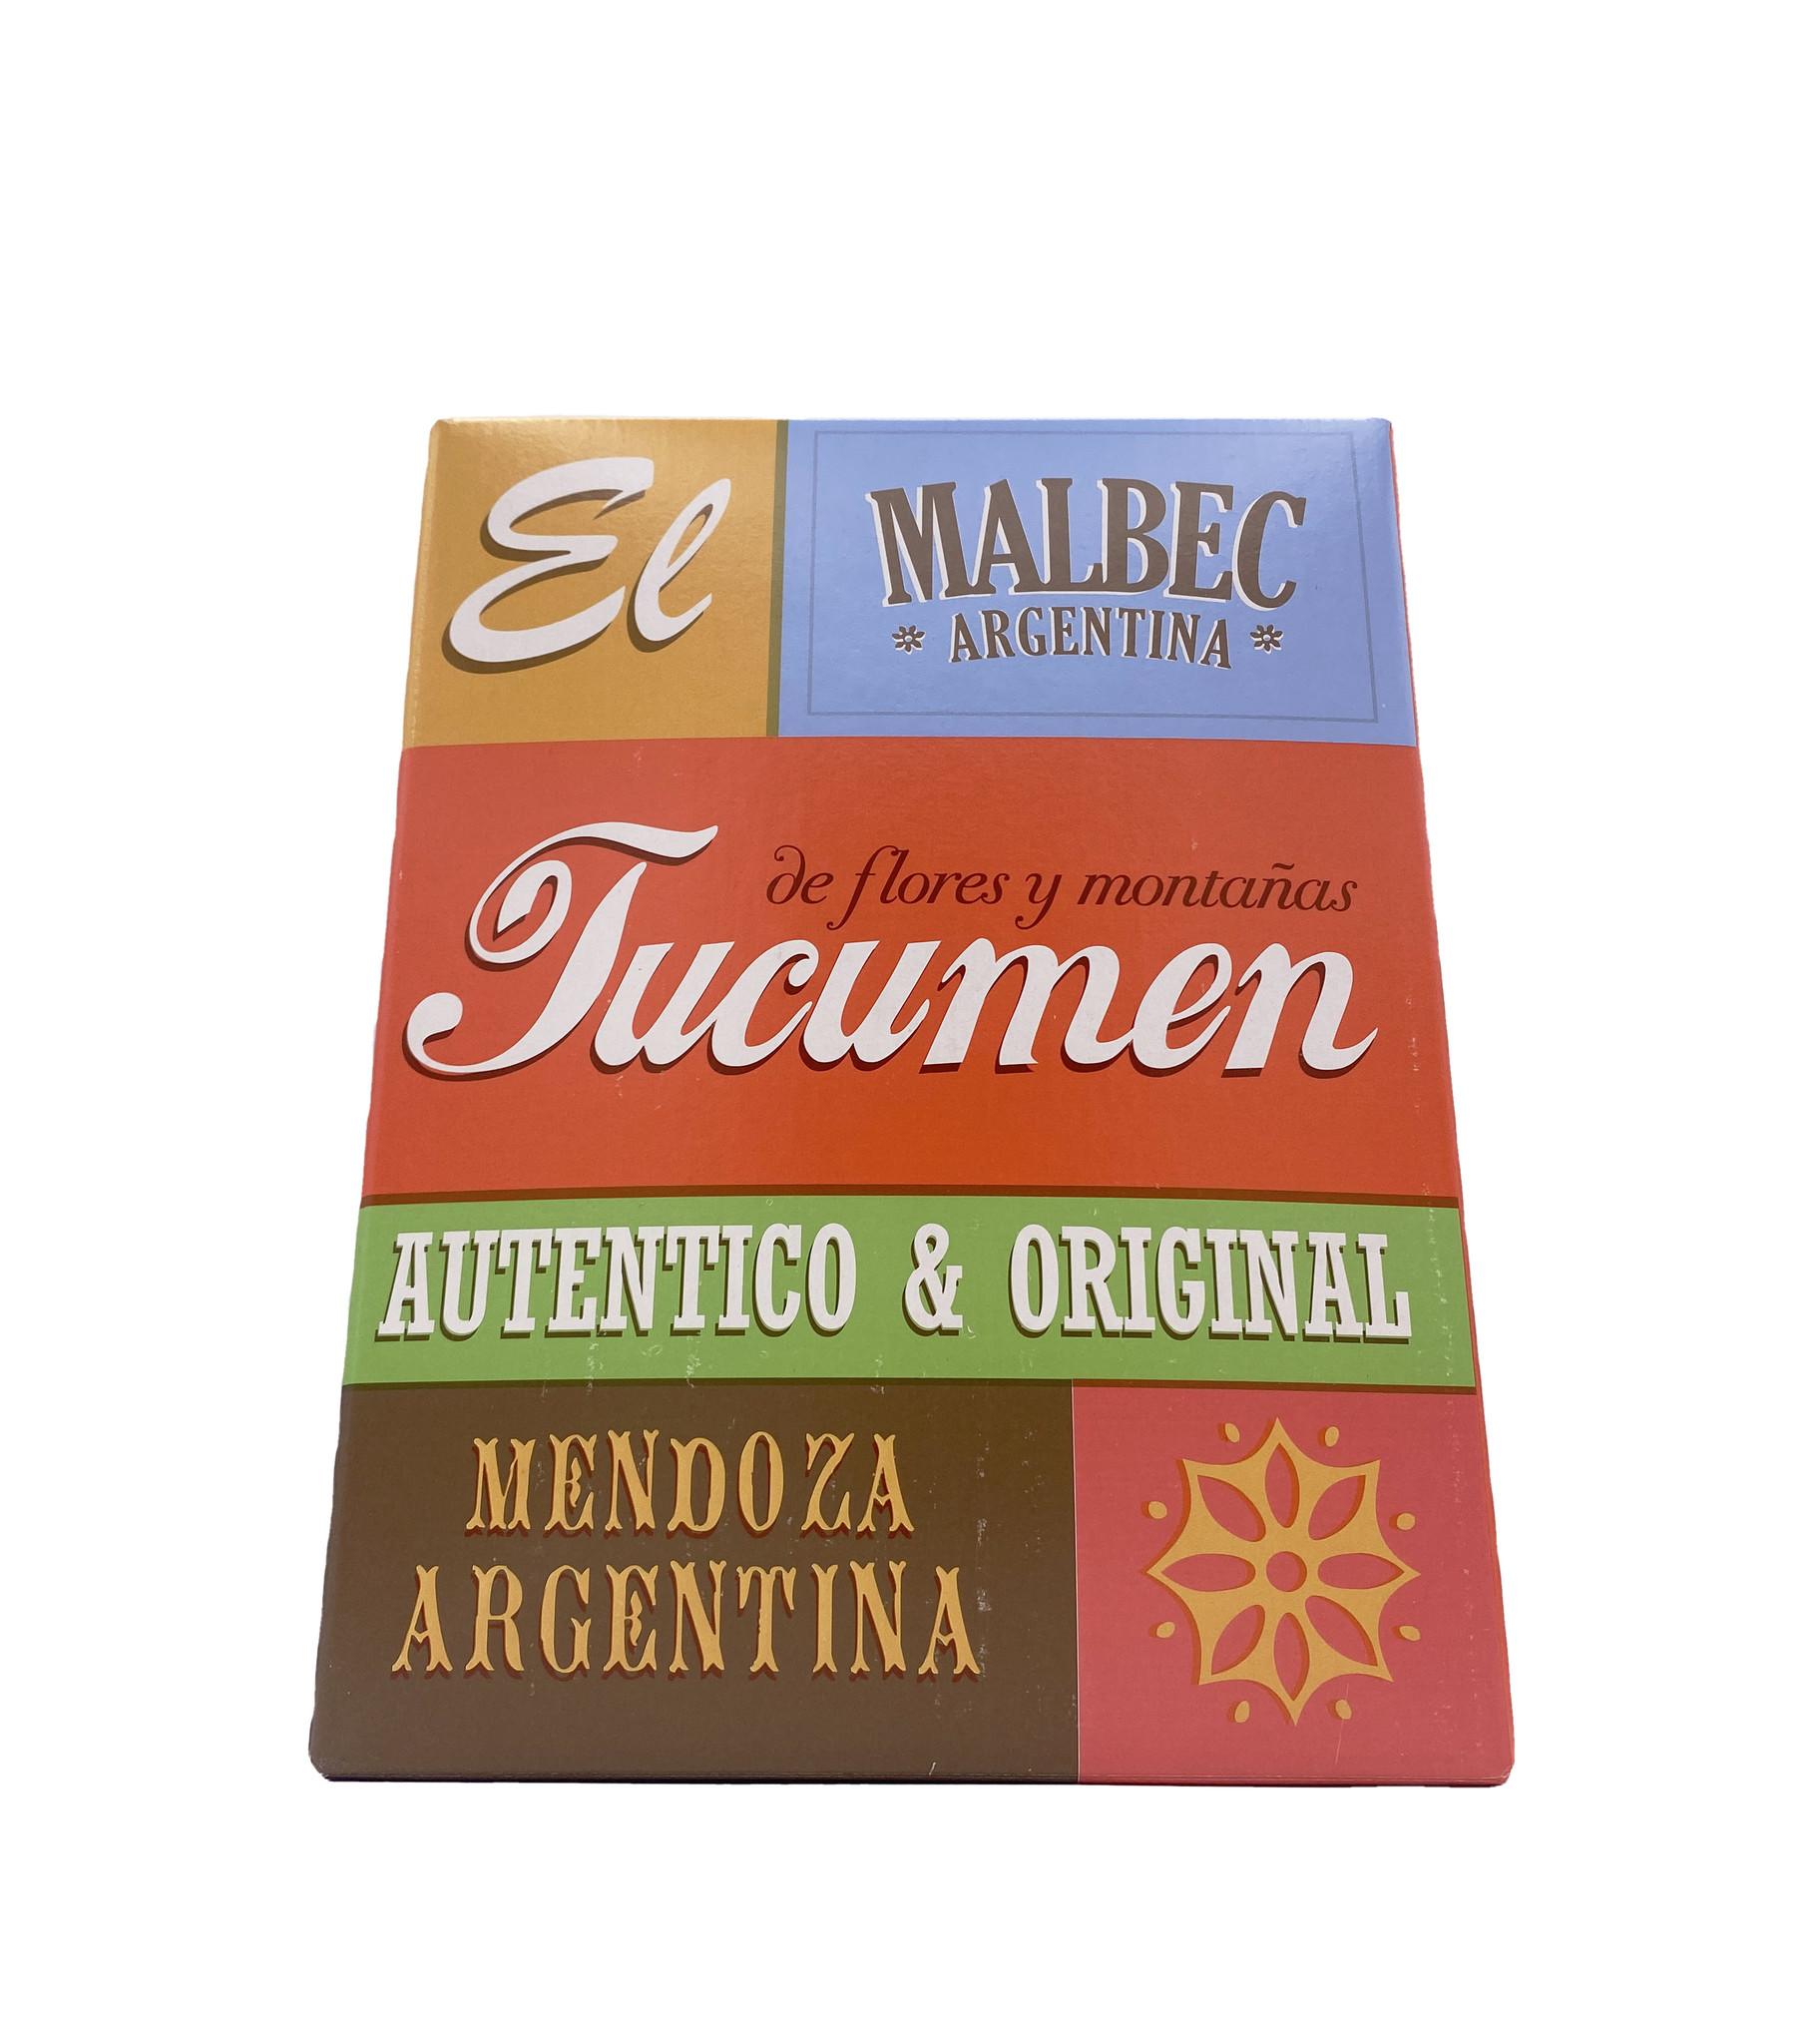 Malbec 2020 3L El Tucumen